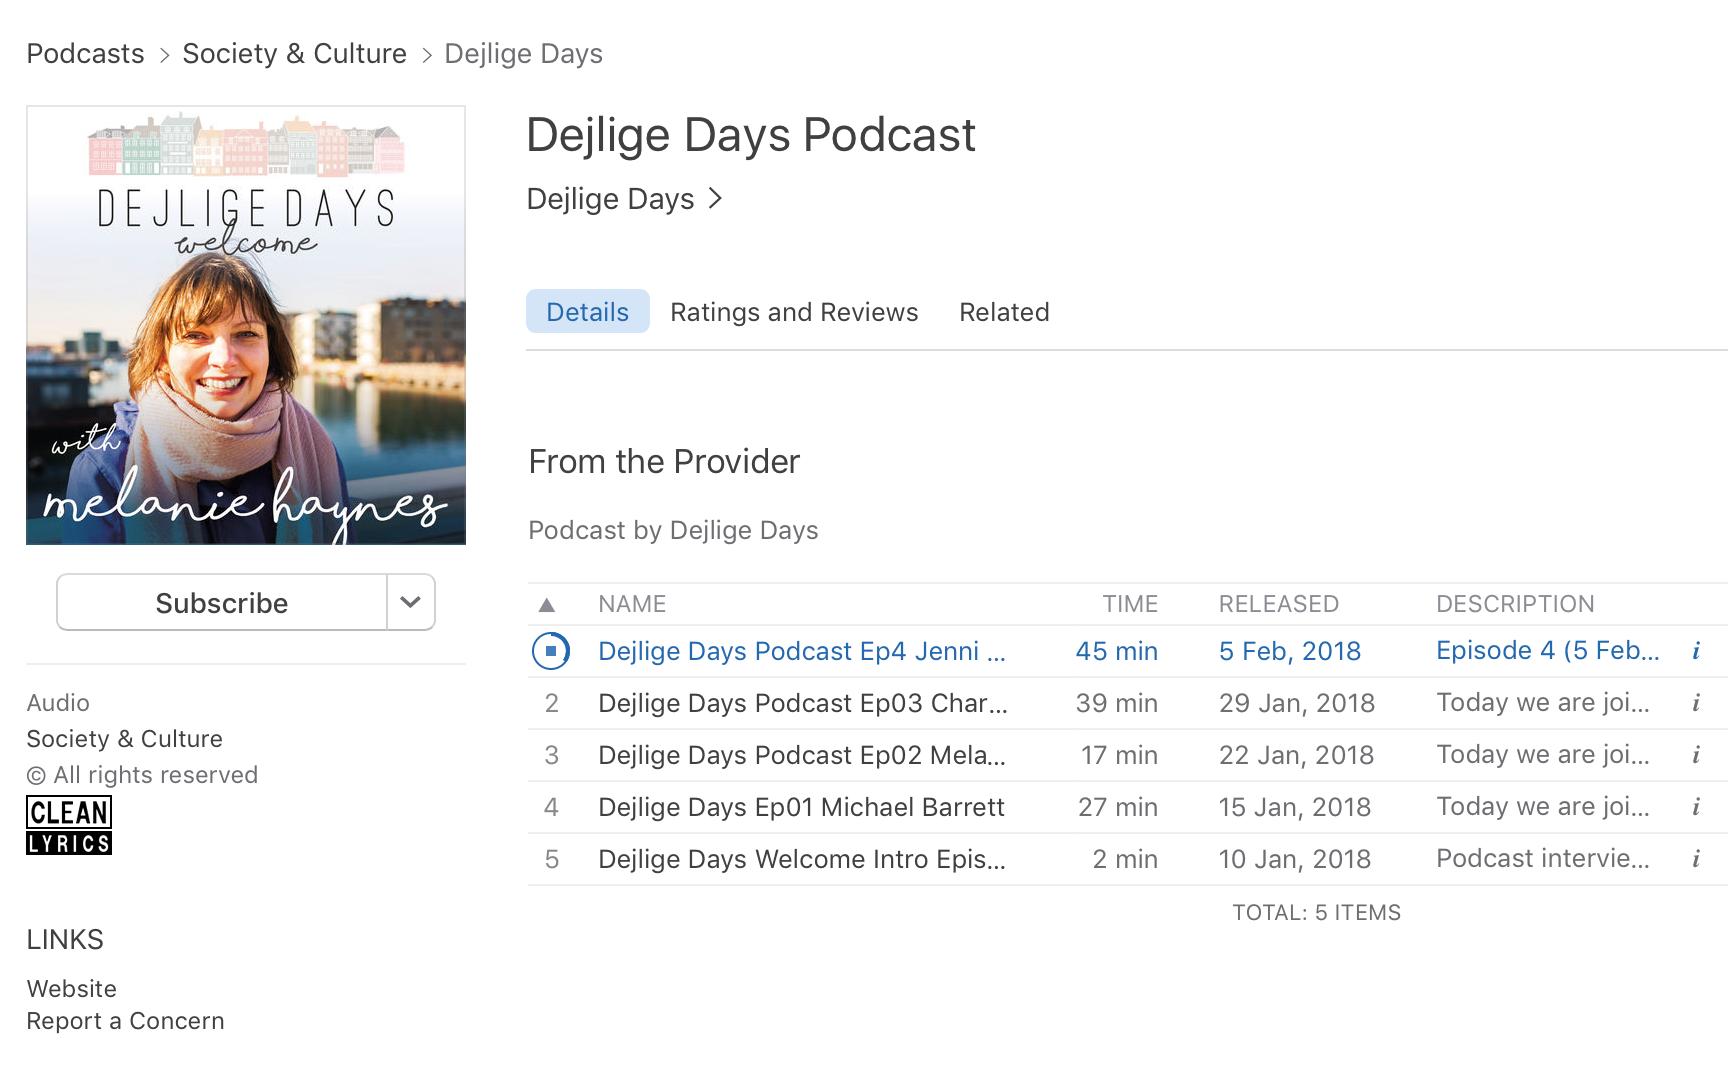 Dejlige Days Podcast